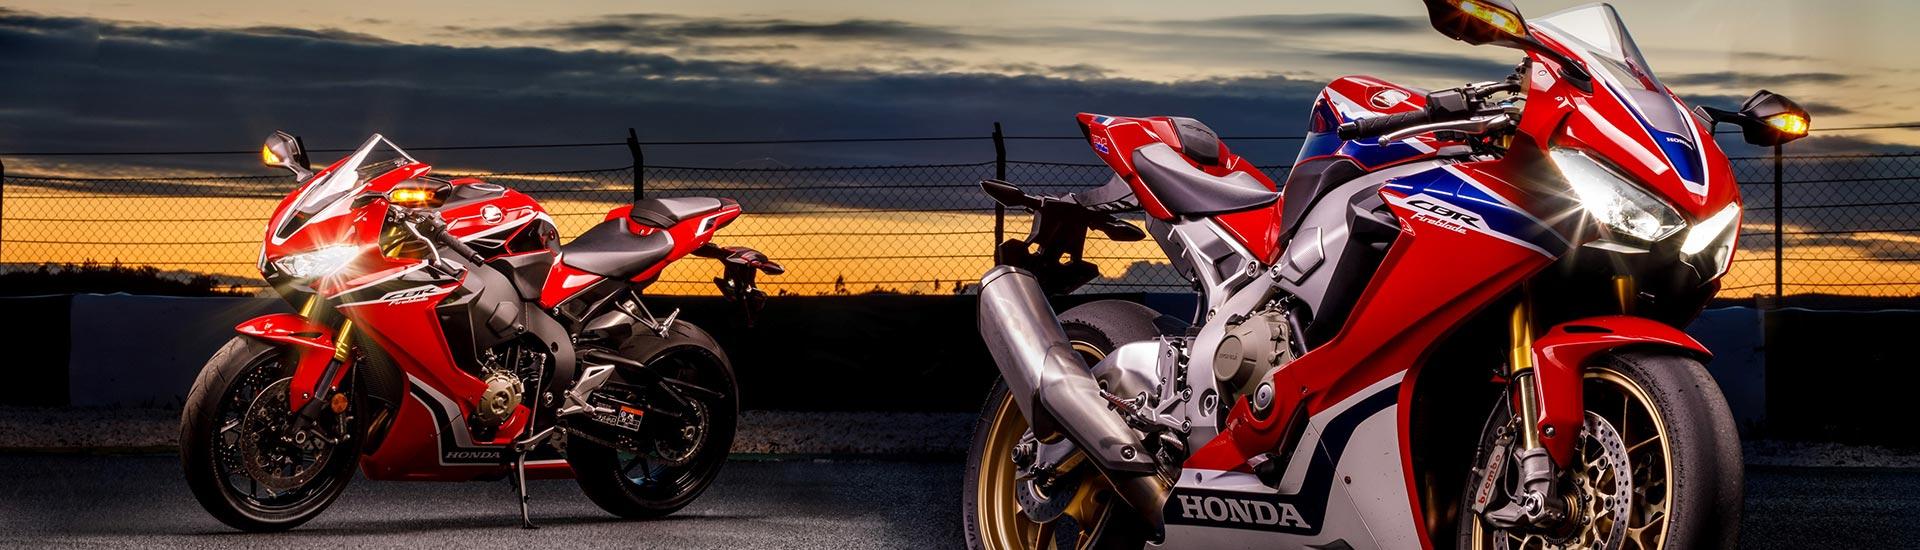 header-honda-ariemolenaarmotors